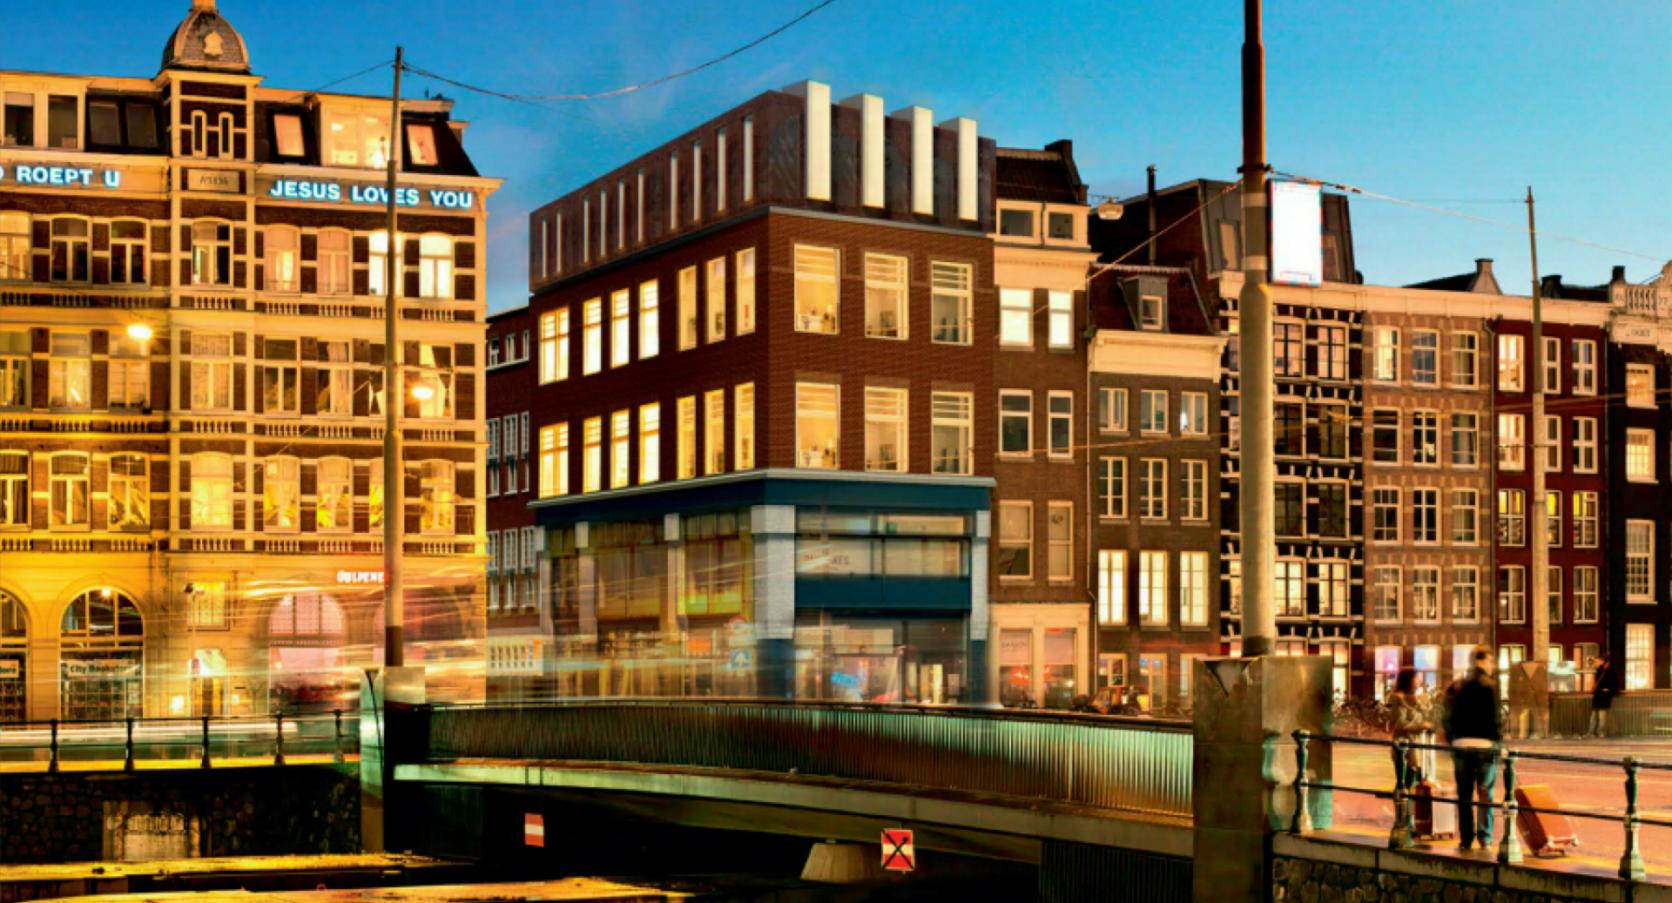 MD Formatura gevelbekleding Prins Hendrinkkade Amsterdam avond